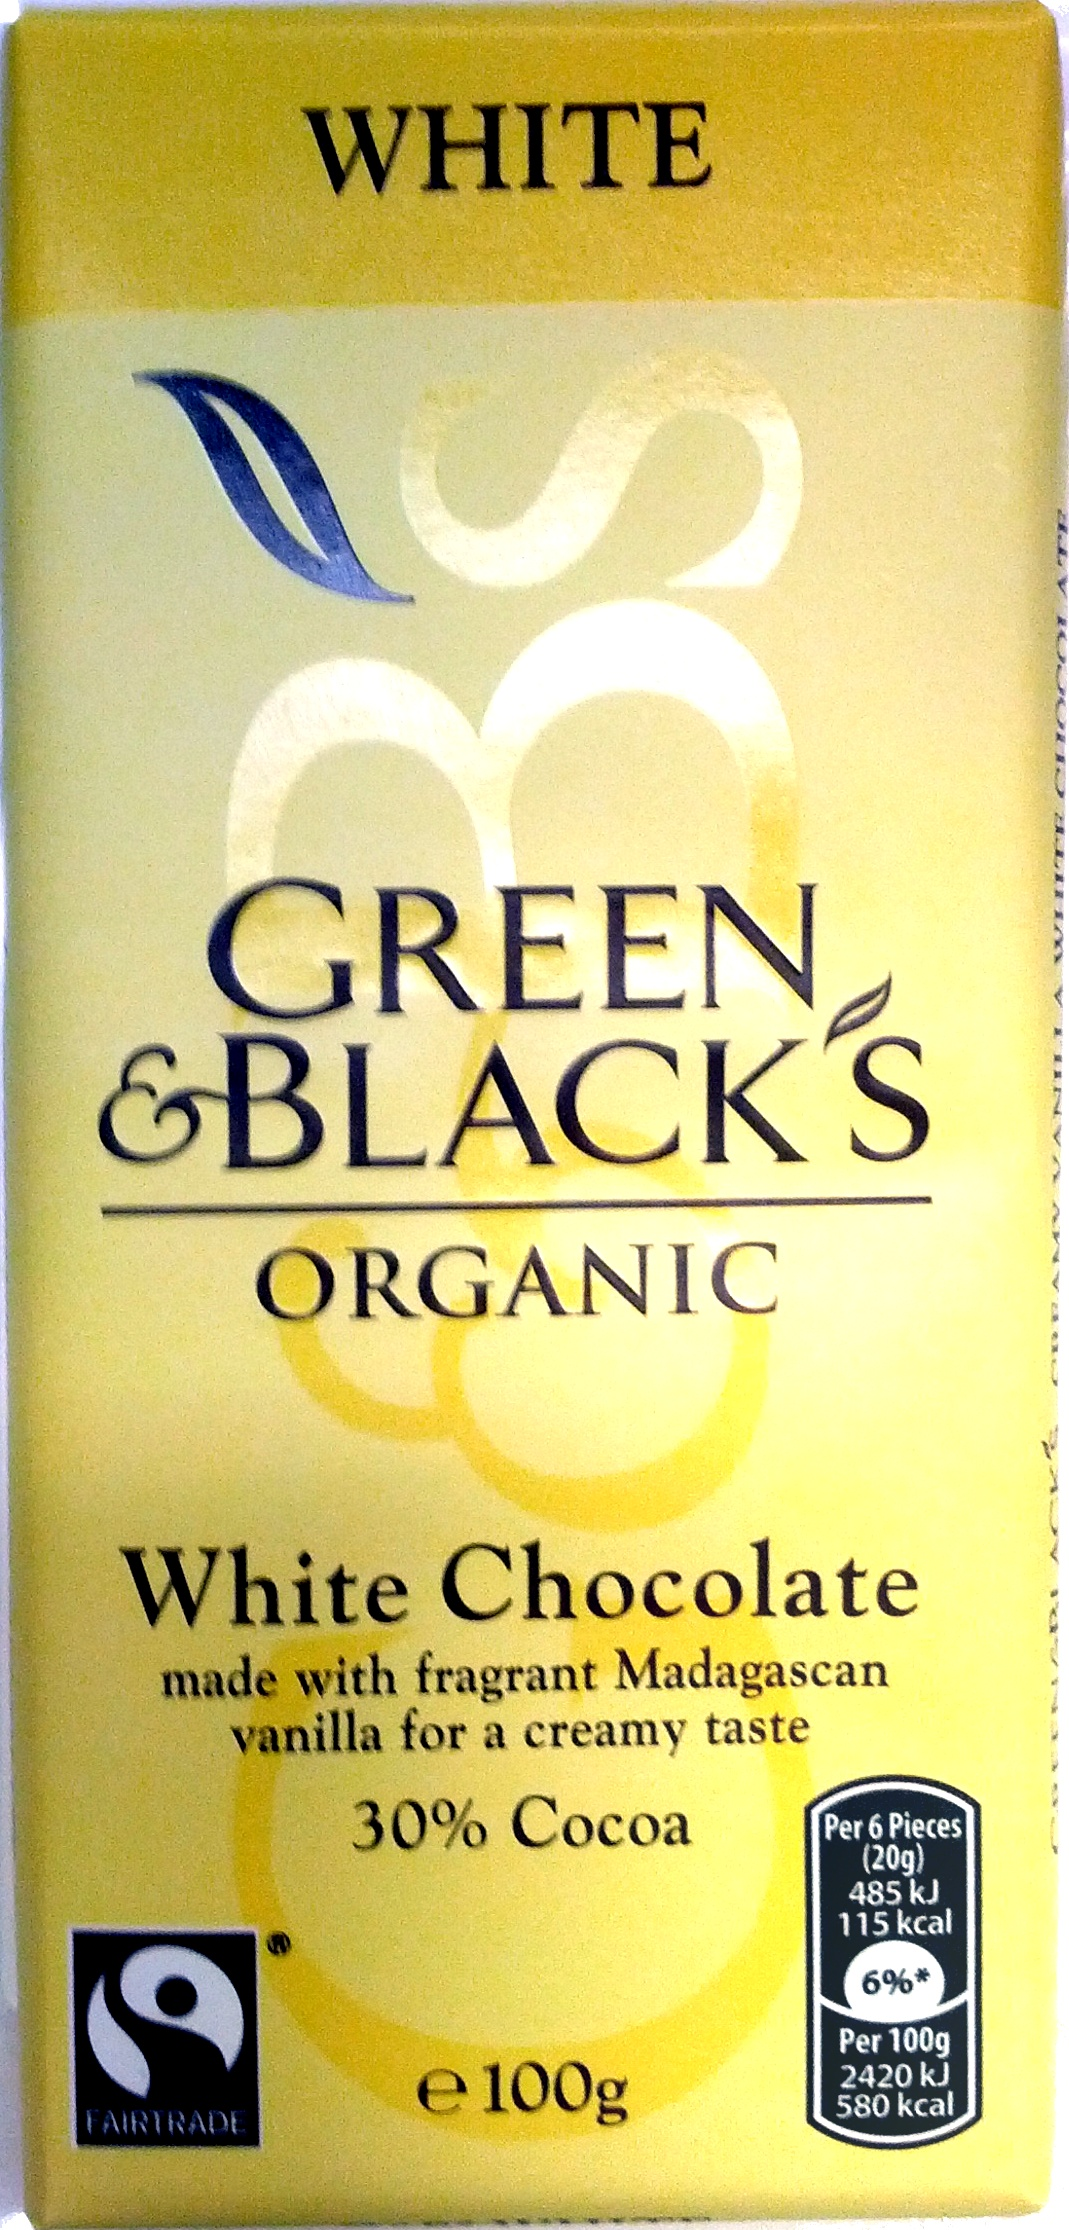 Green & black's organic chocolate bar white - Product - en